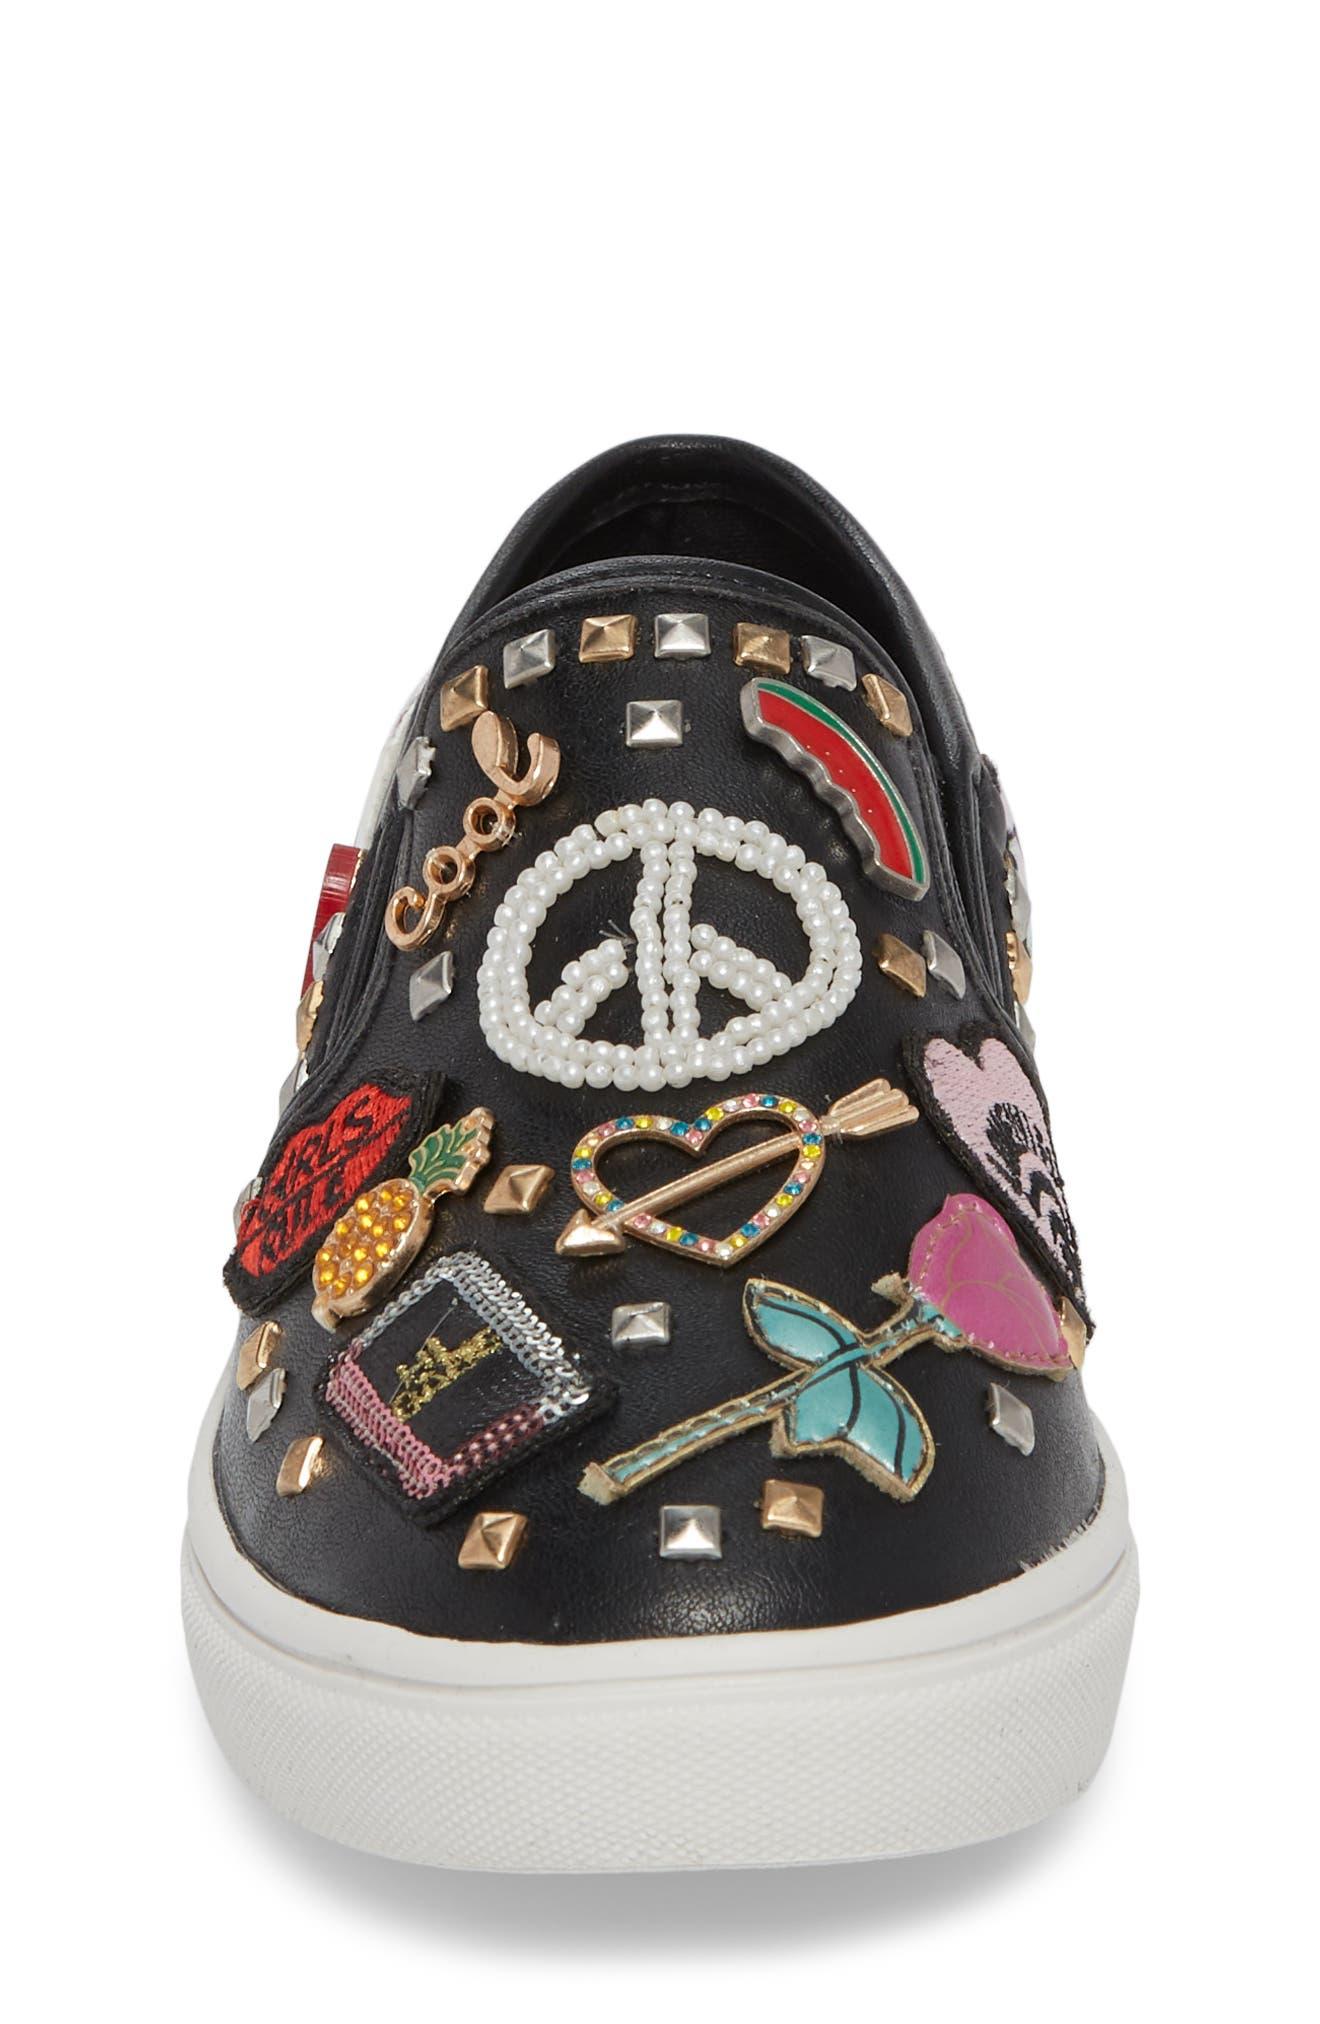 JCraze Embellished Slip-On Sneaker,                             Alternate thumbnail 4, color,                             Black